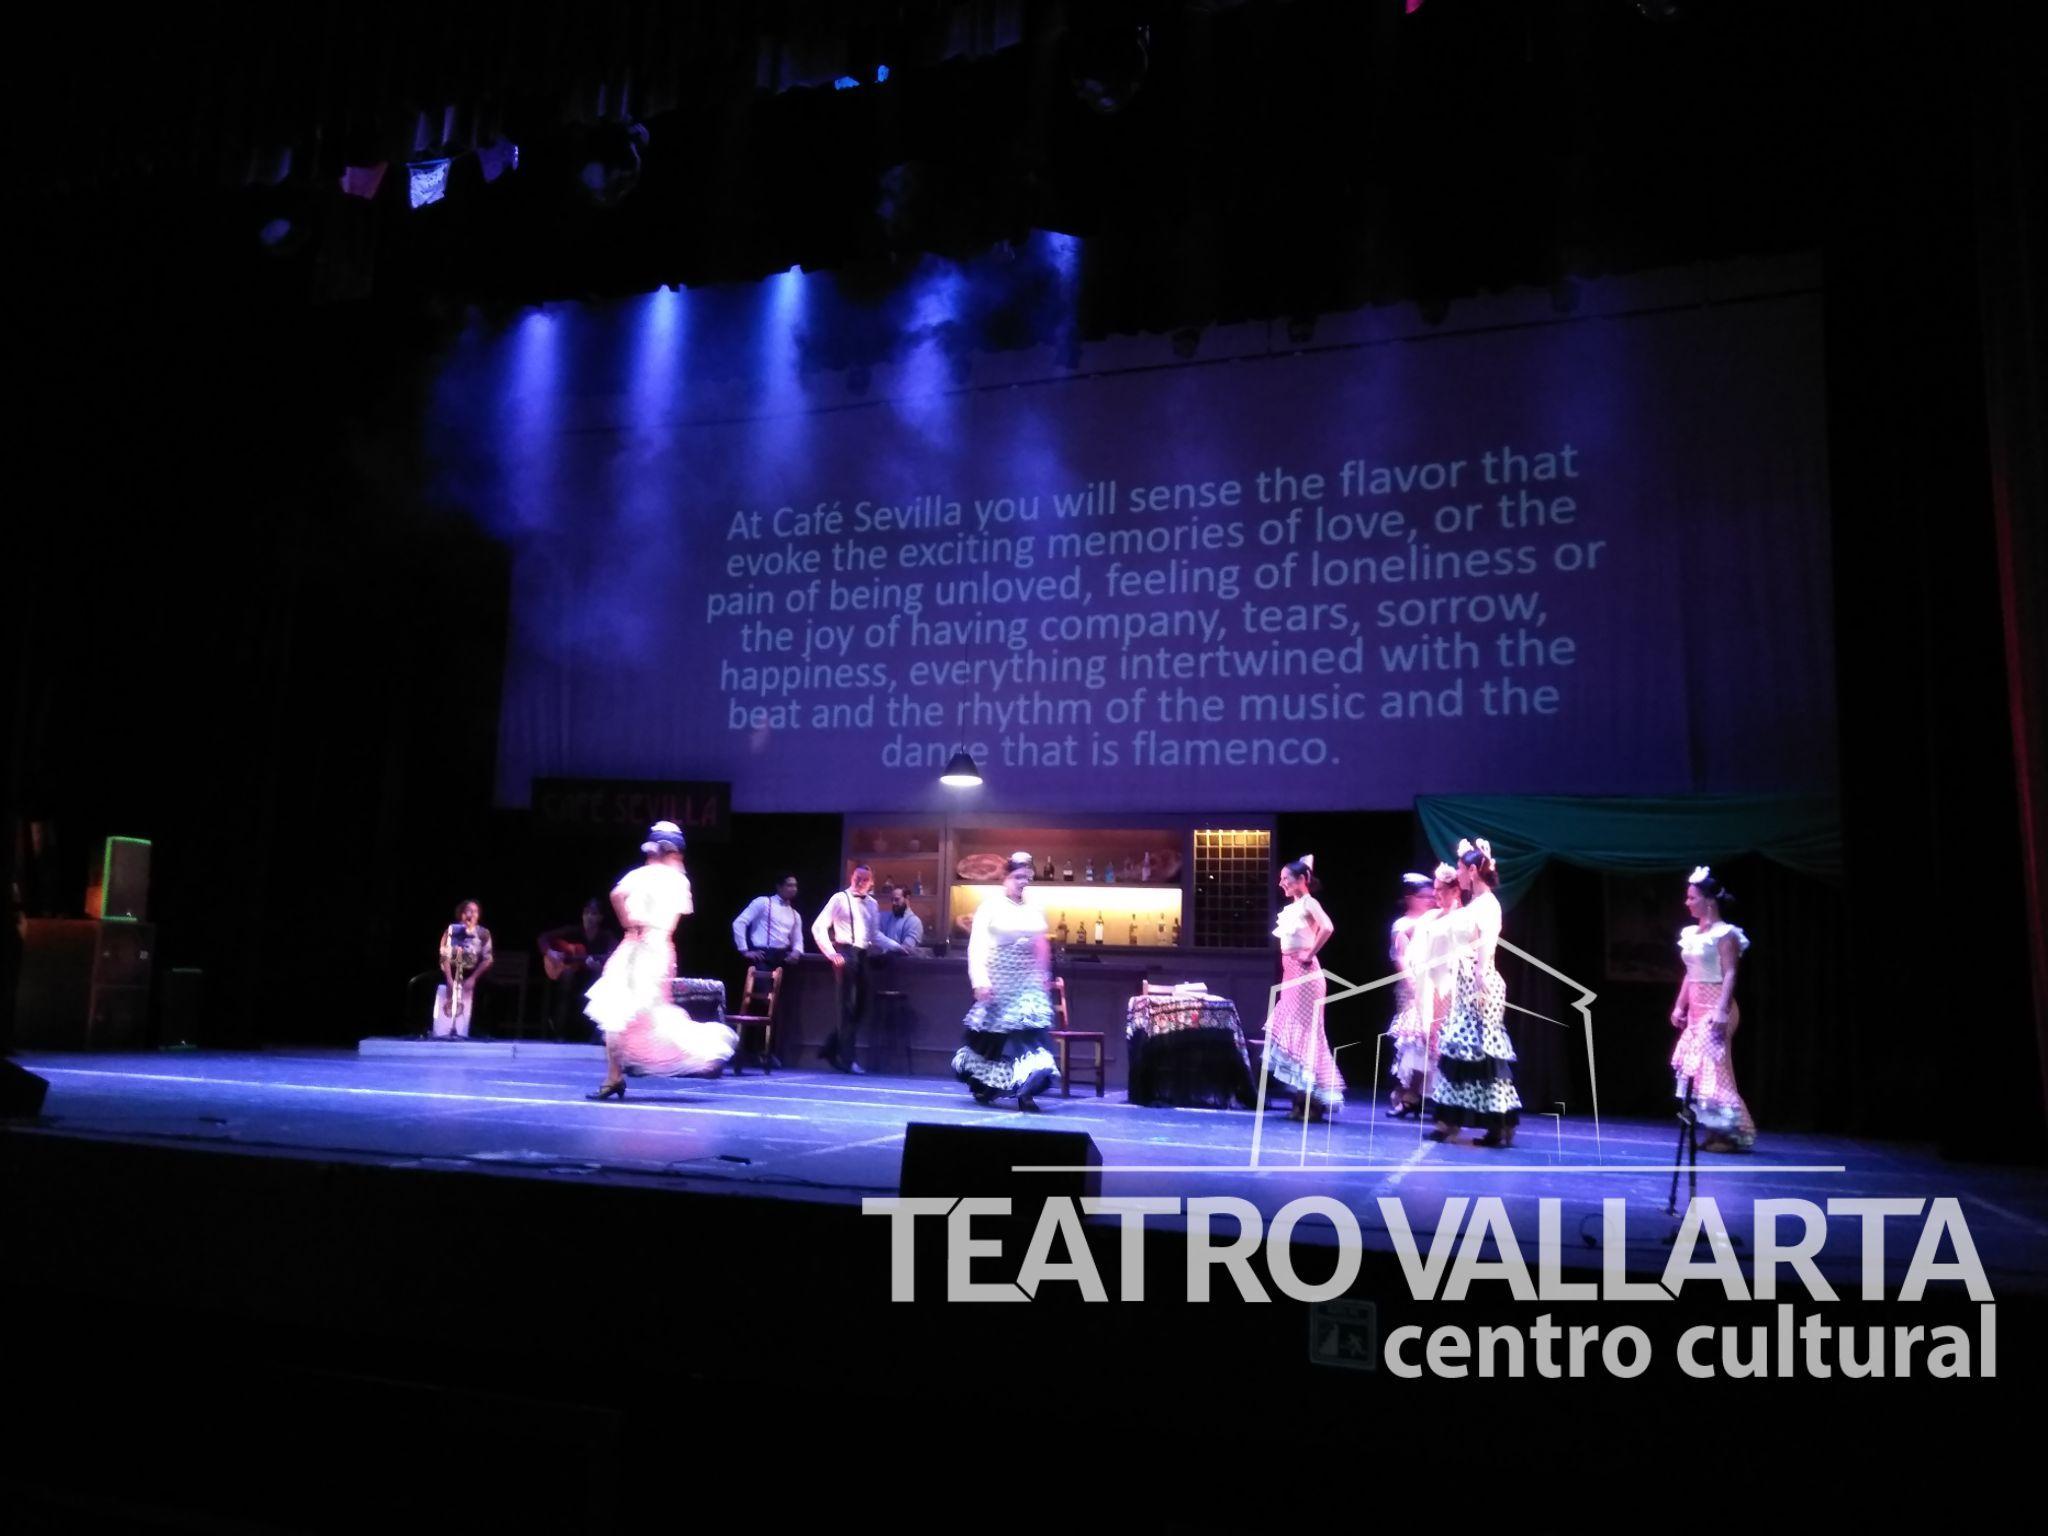 Cafe Sevilla Sabado 9 Feb 2019 19 00 Hrs Boletos En Taquilla De Teatro Vallarta Taquilla Chicken House Salds Plaza Galerias Y Lago Real Sevilla Taquilla